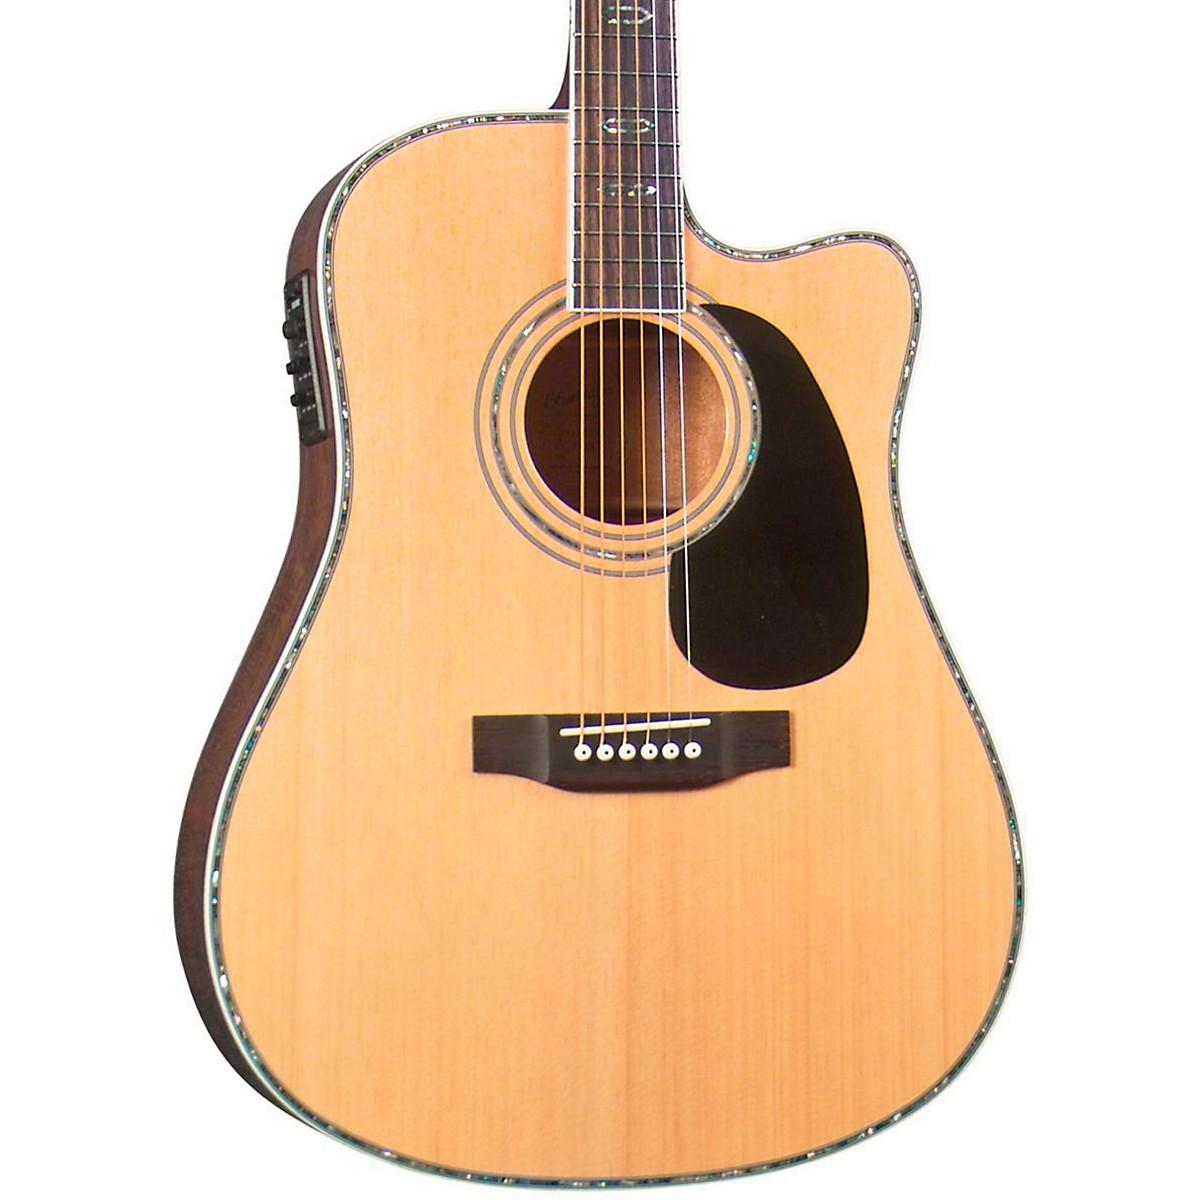 Blueridge BR-70CE Cutaway Acoustic-Electric Dreadnought Guitar